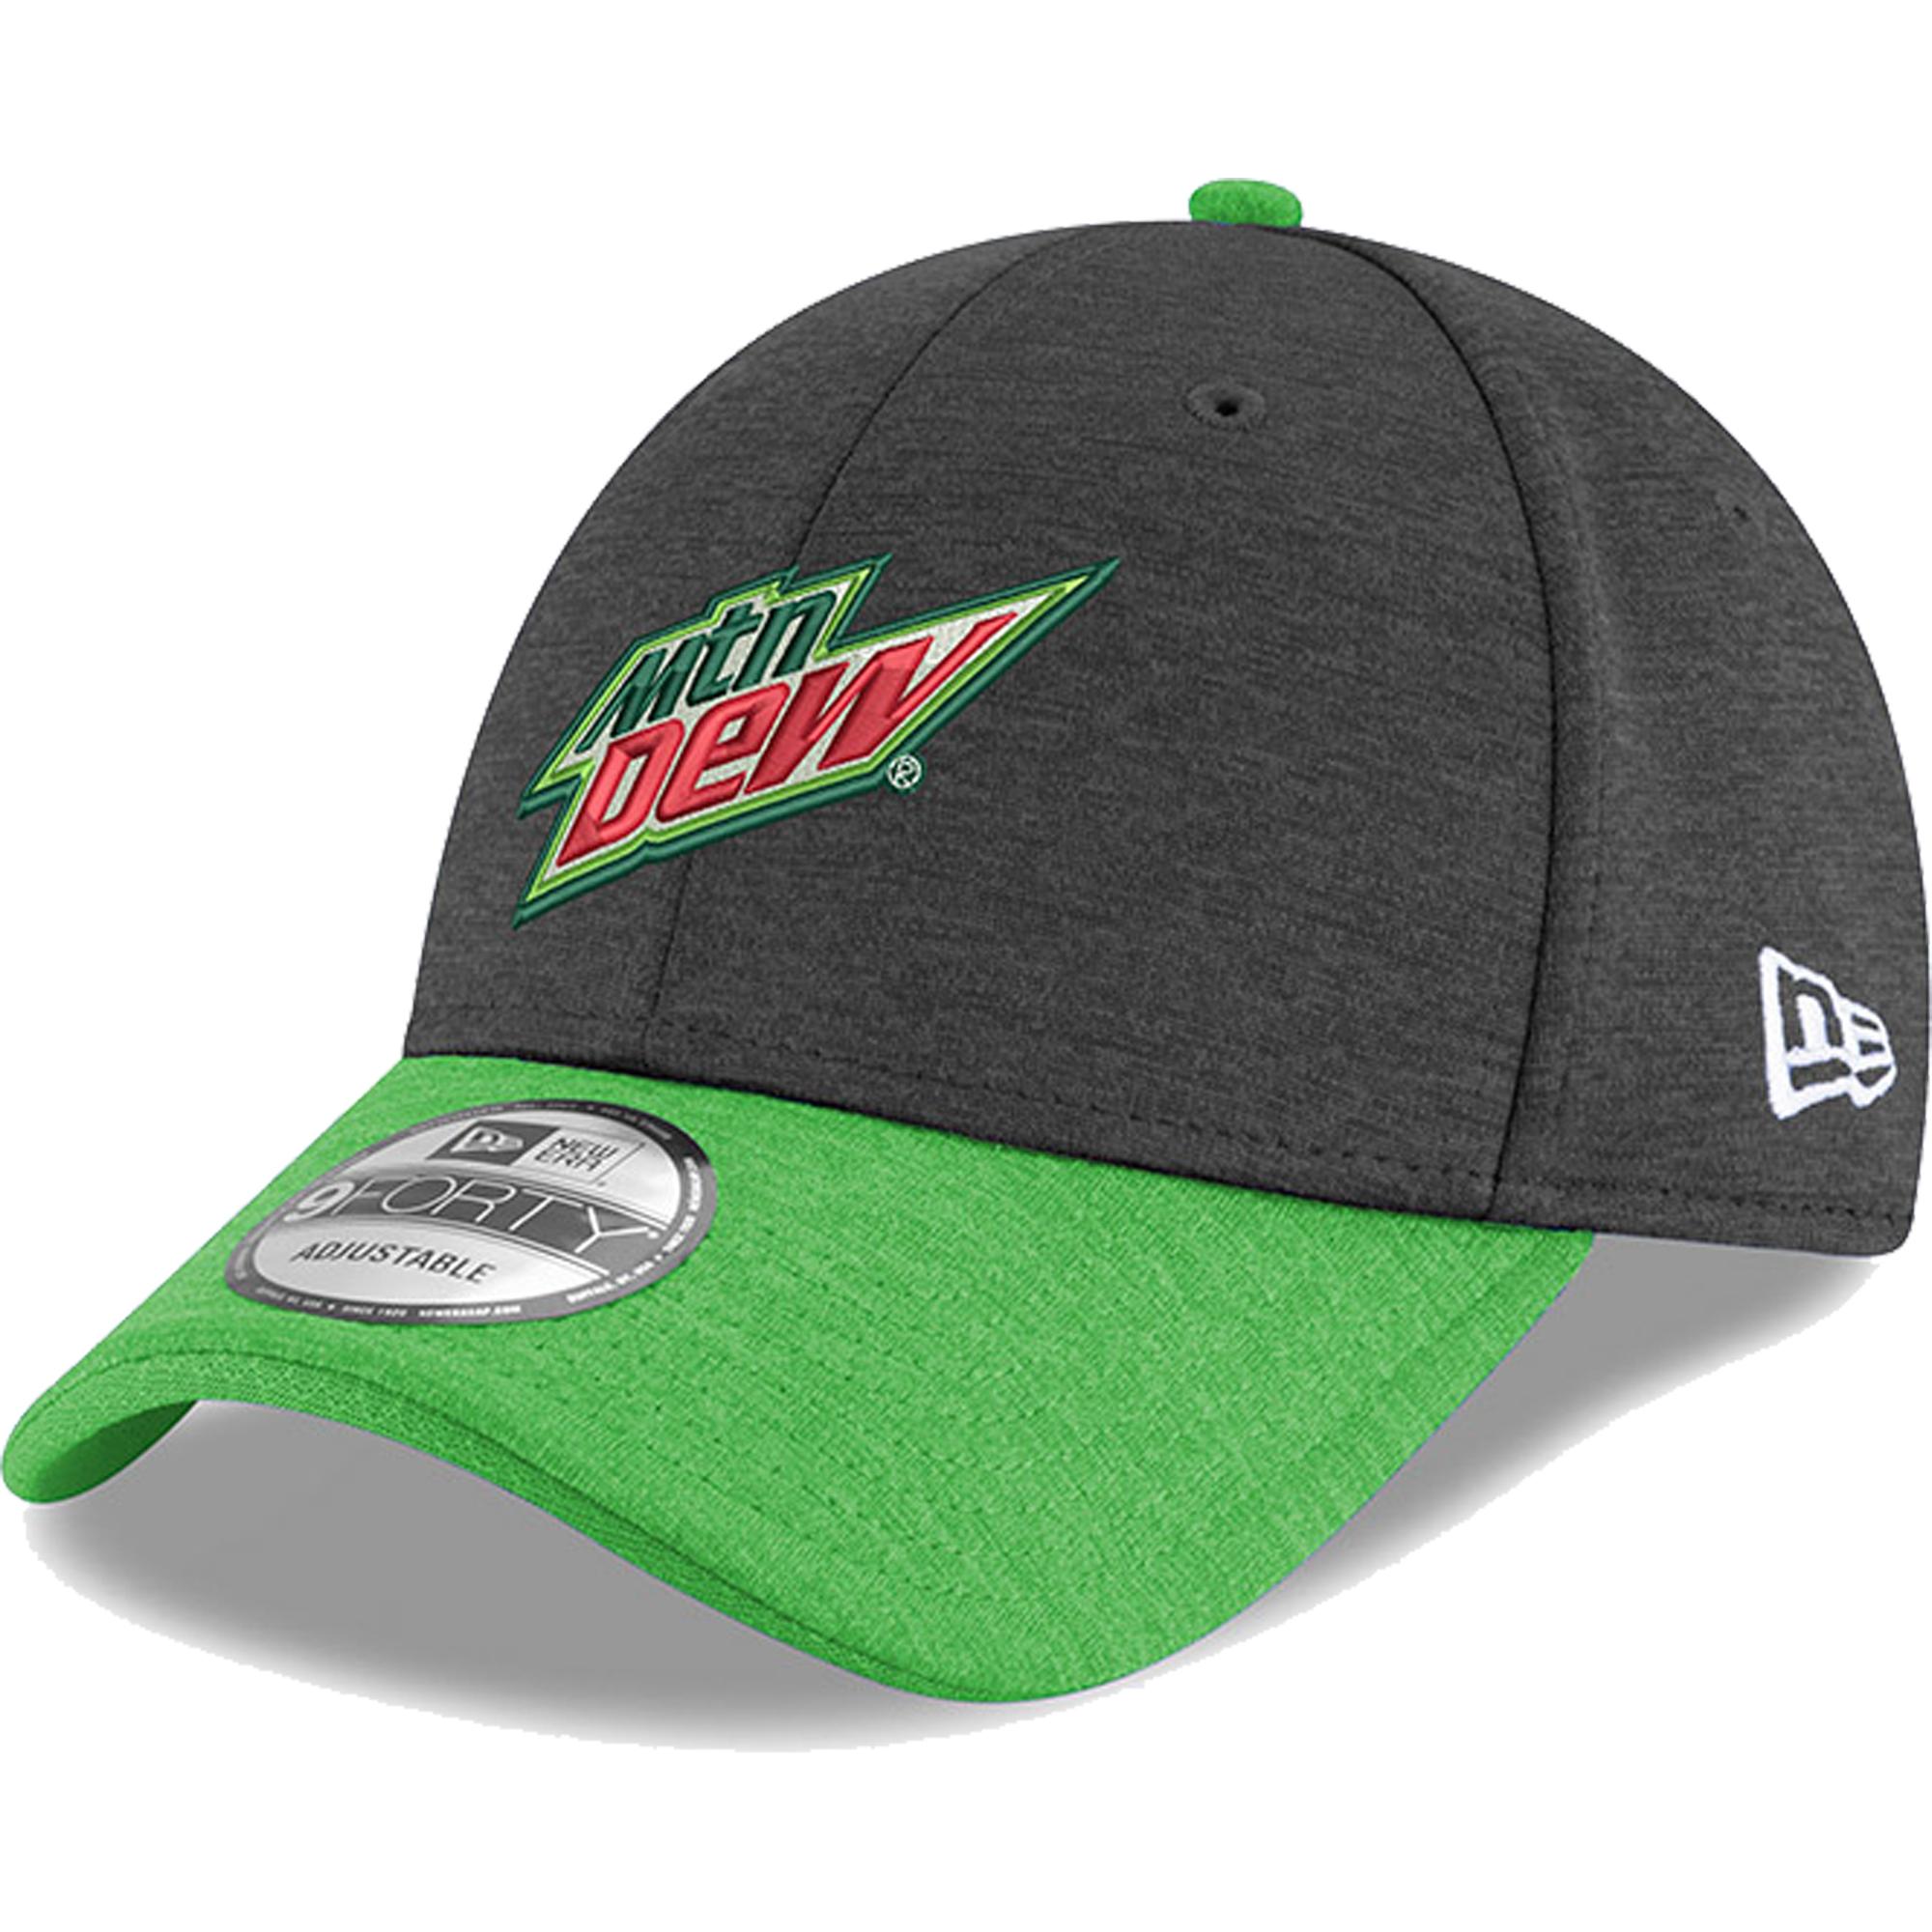 Chase Elliott New Era Mountain Dew Driver 9FORTY Adjustable Hat - Black - OSFA